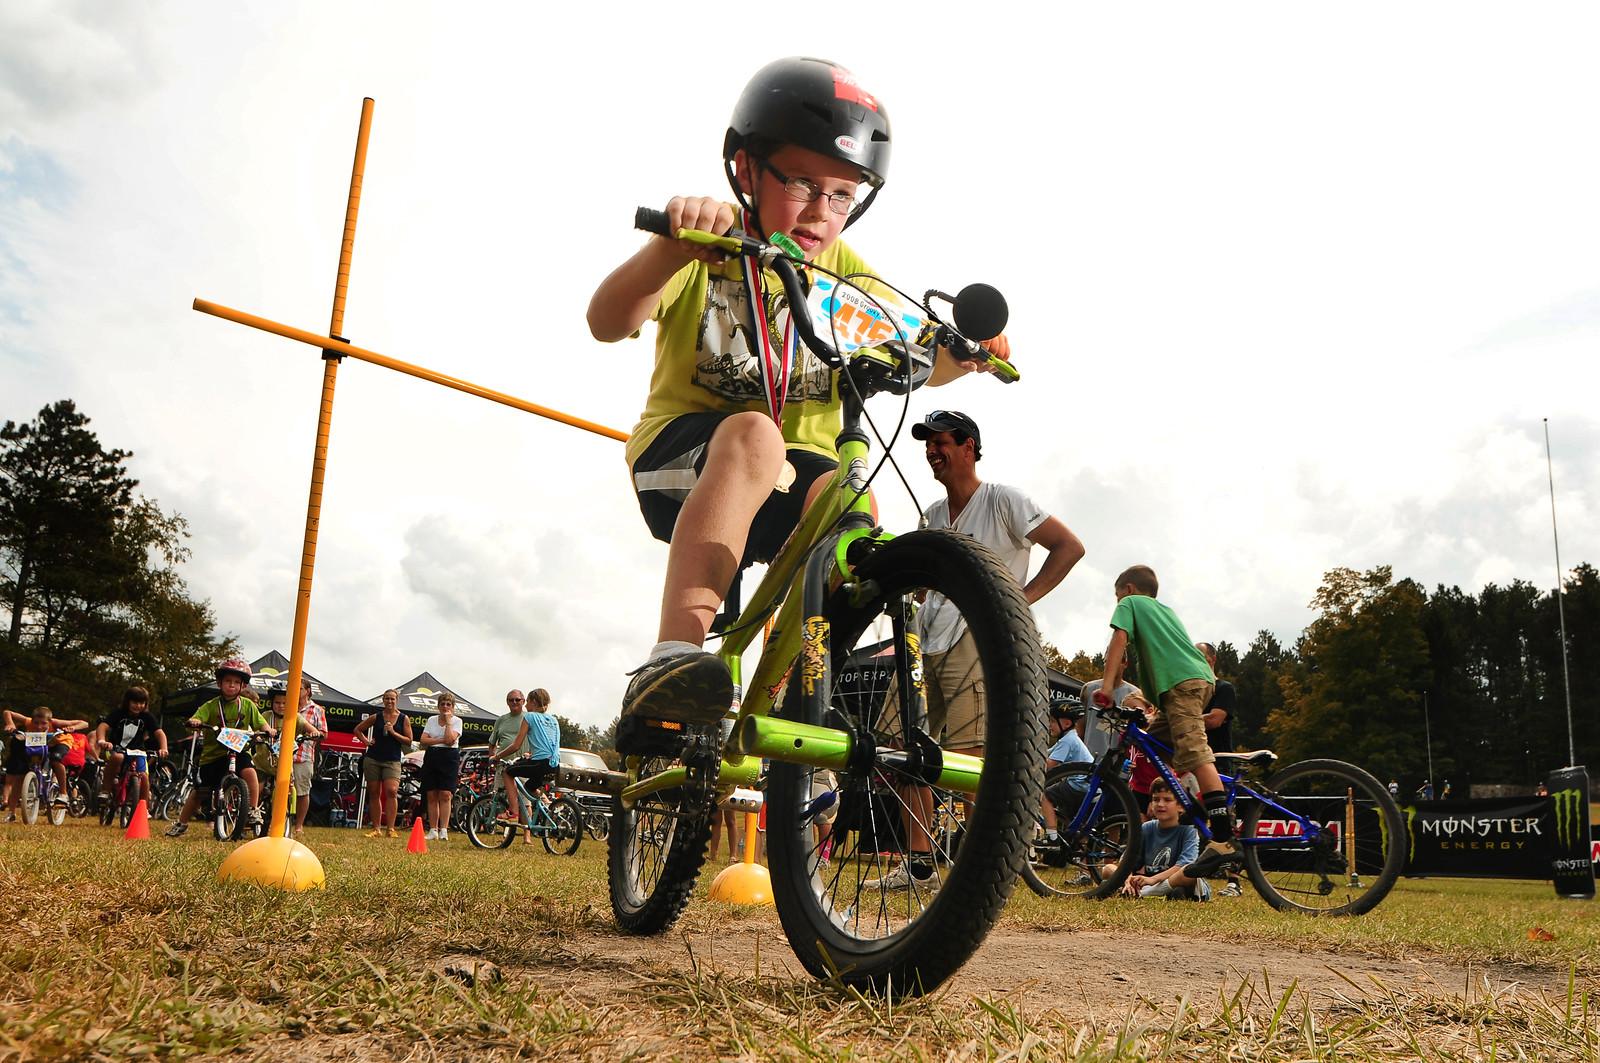 BVR LI A 0006 - AllMountainImaging - Mountain Biking Pictures - Vital MTB